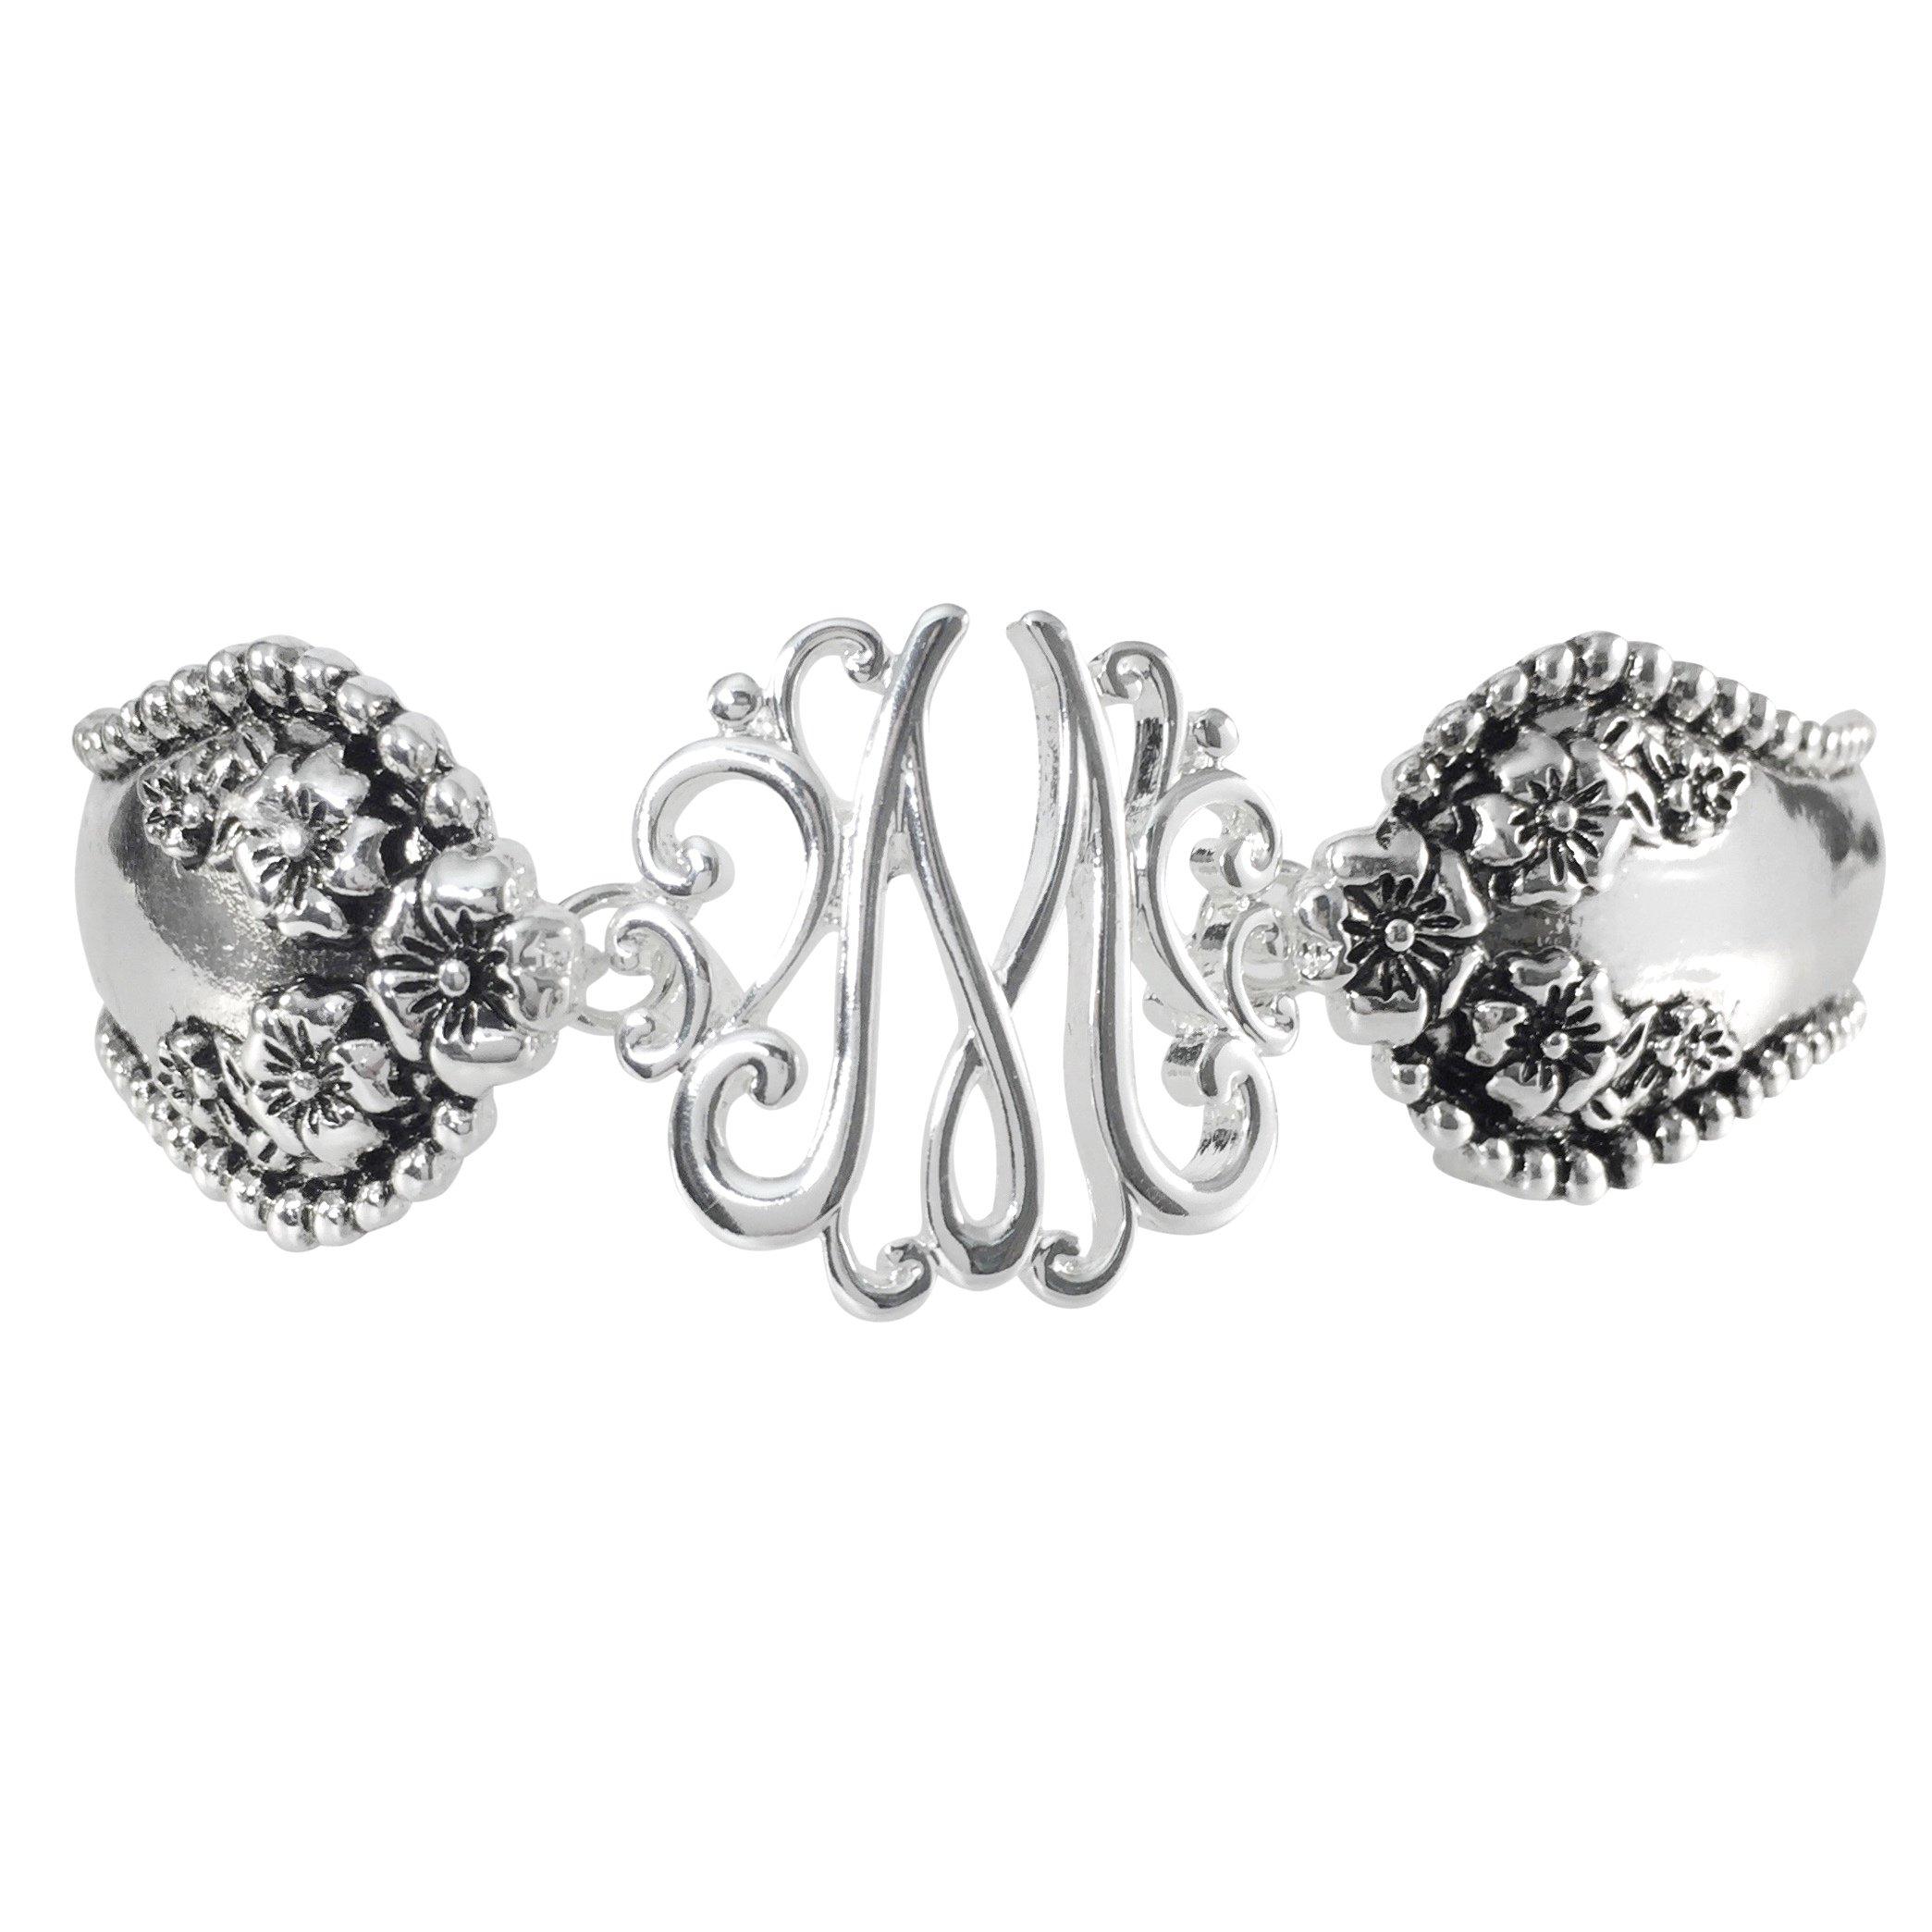 Spoon Handle Style Monogram Initial Silver Tone Magnetic Clasp Bracelet (Letter M)